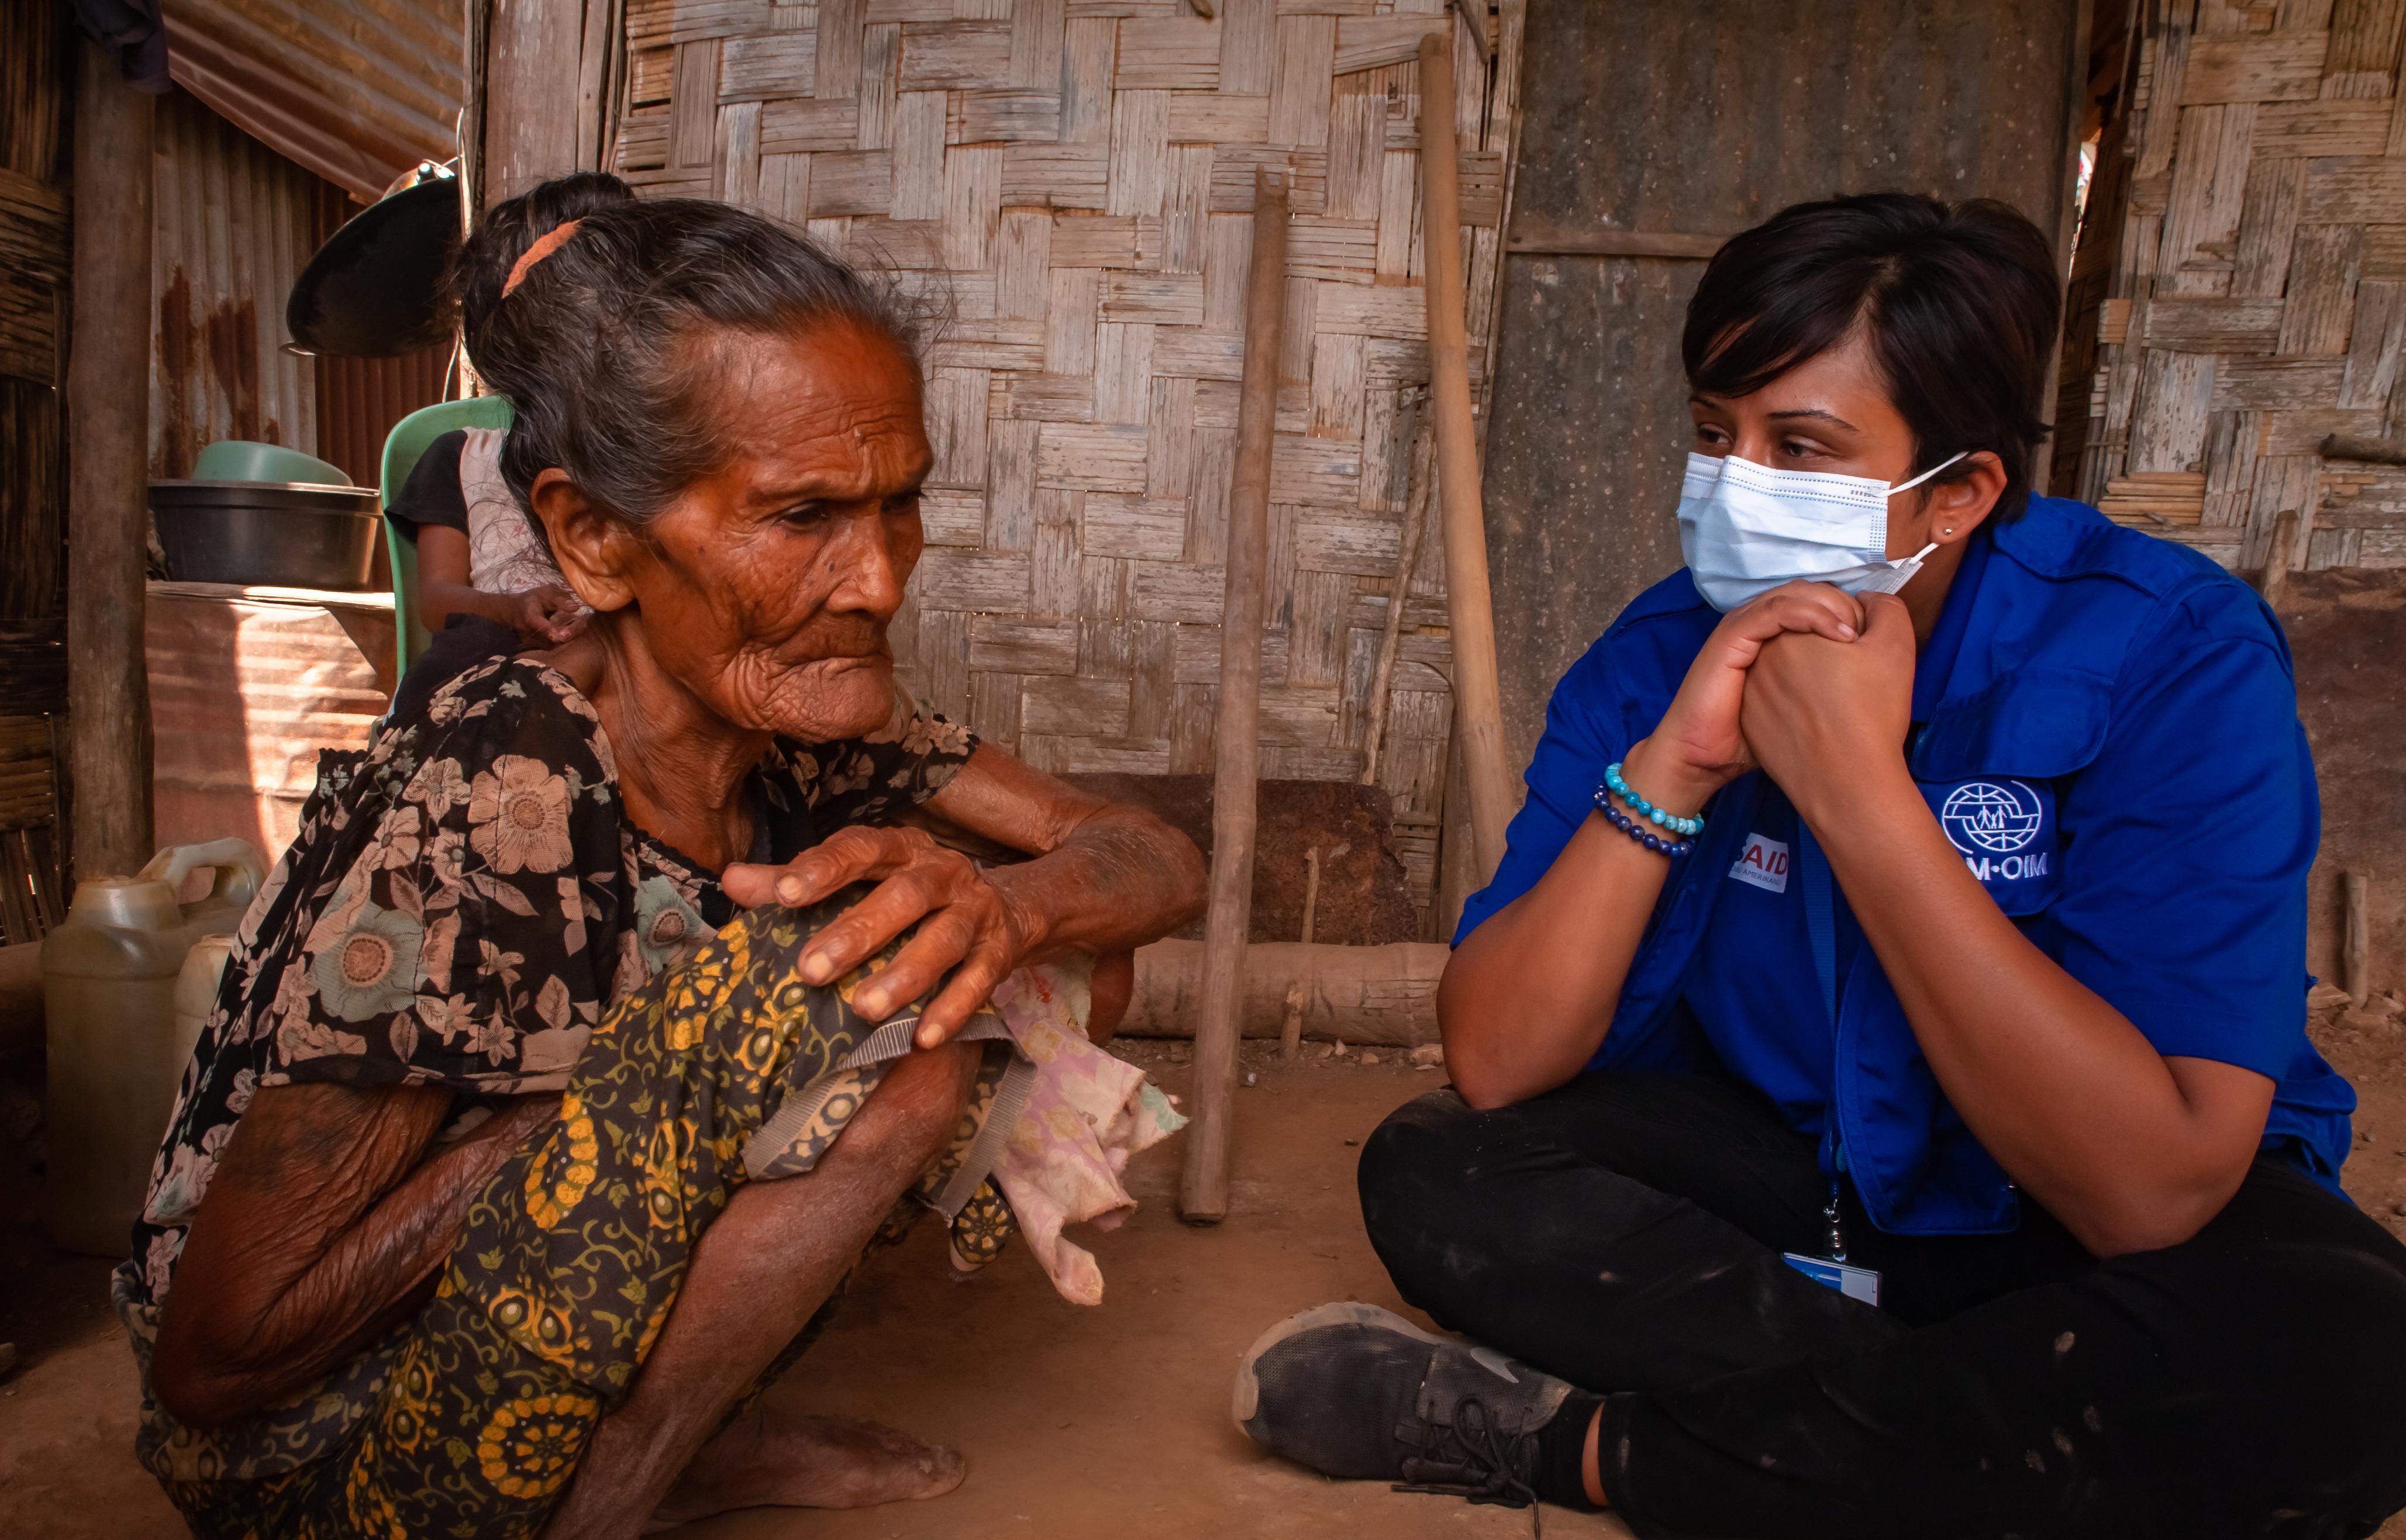 USAID, IOM Support Communities Affected by Devastating Floods and Landslides in Timor-Leste